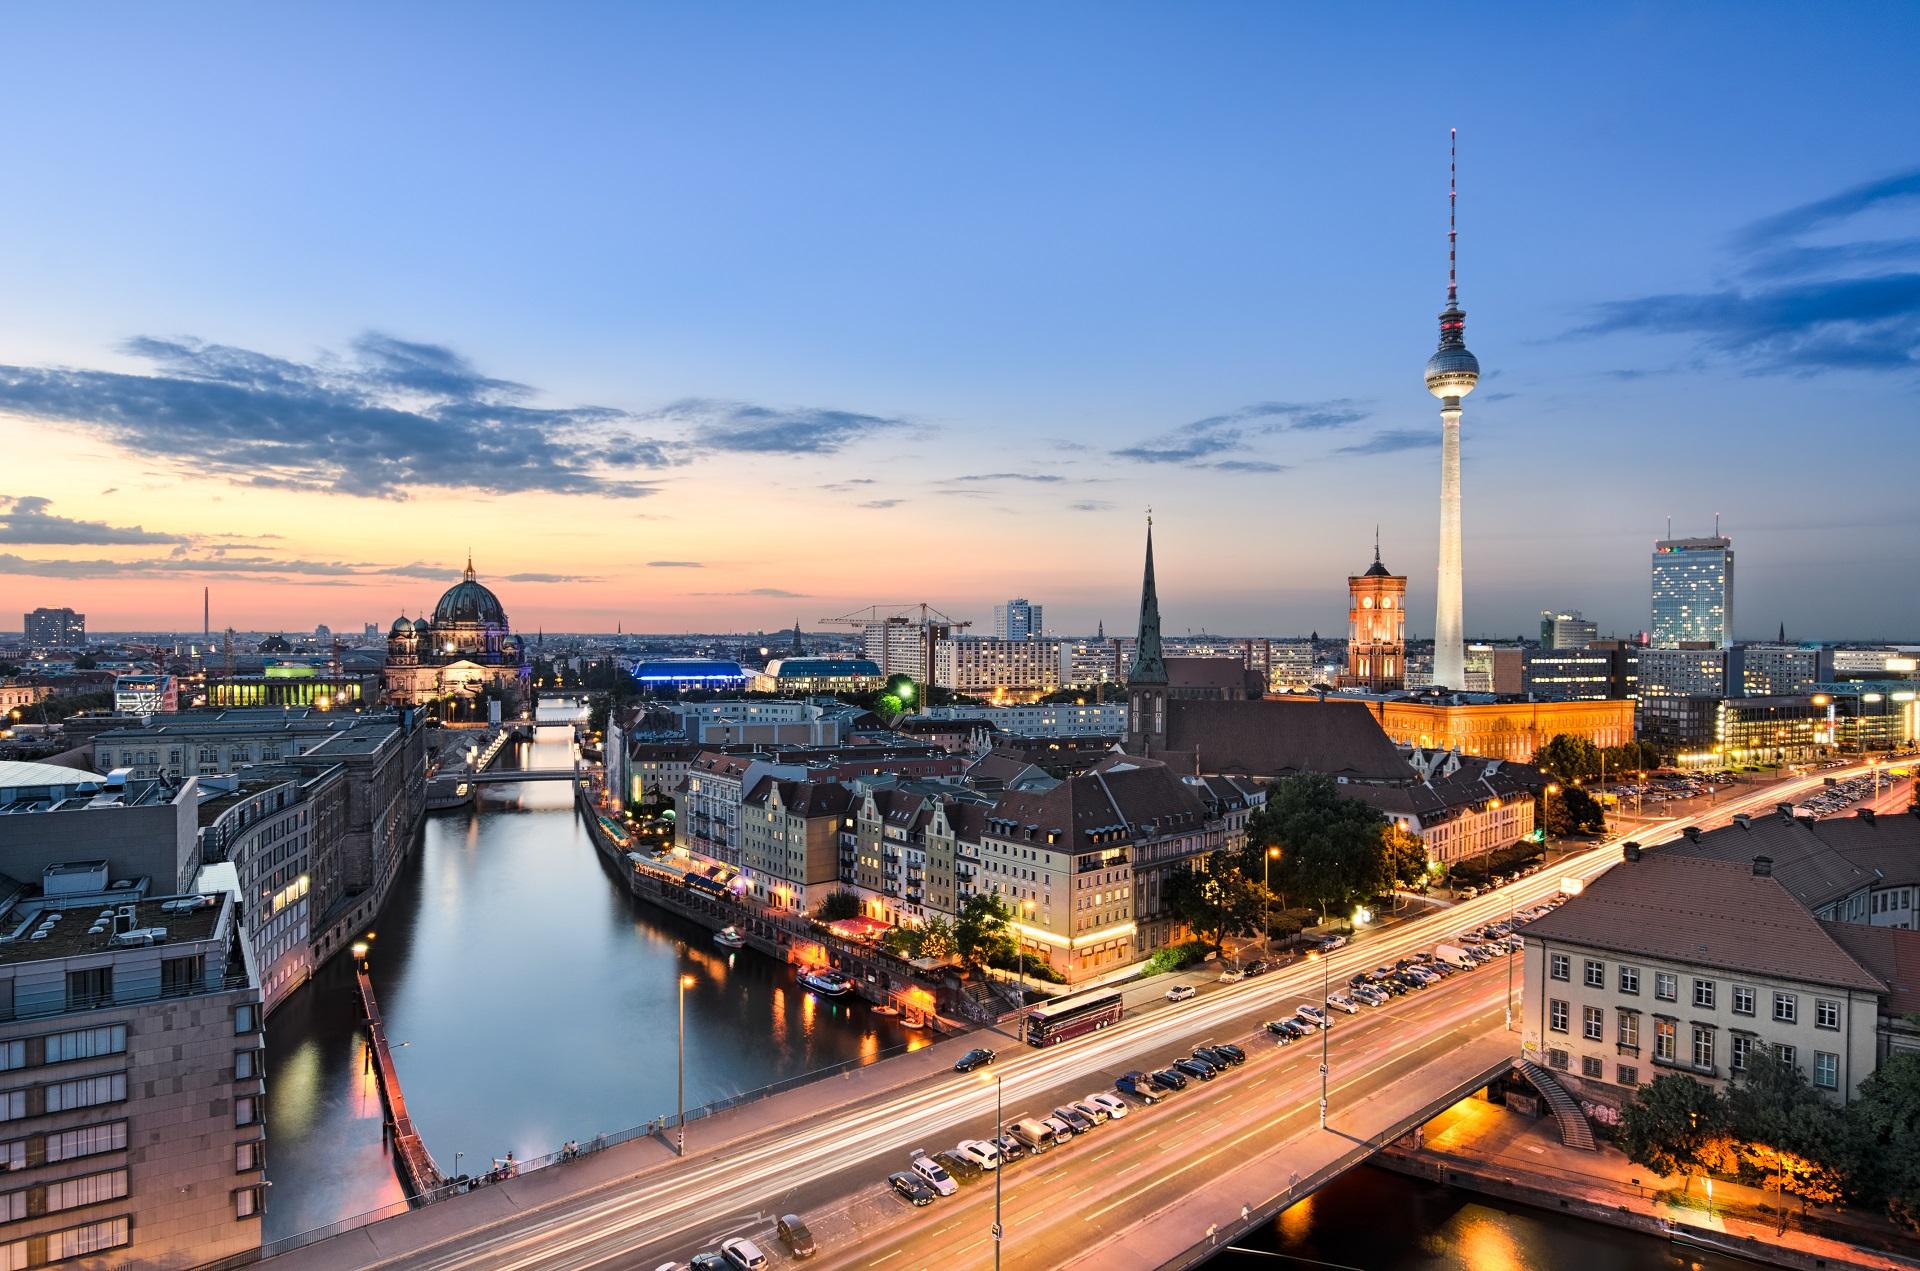 watado.de?  Übernachtung in Berlin inkl. Wellness und SPA im 4 Sterne Hotel in Berlin ab 34,50€ p.P